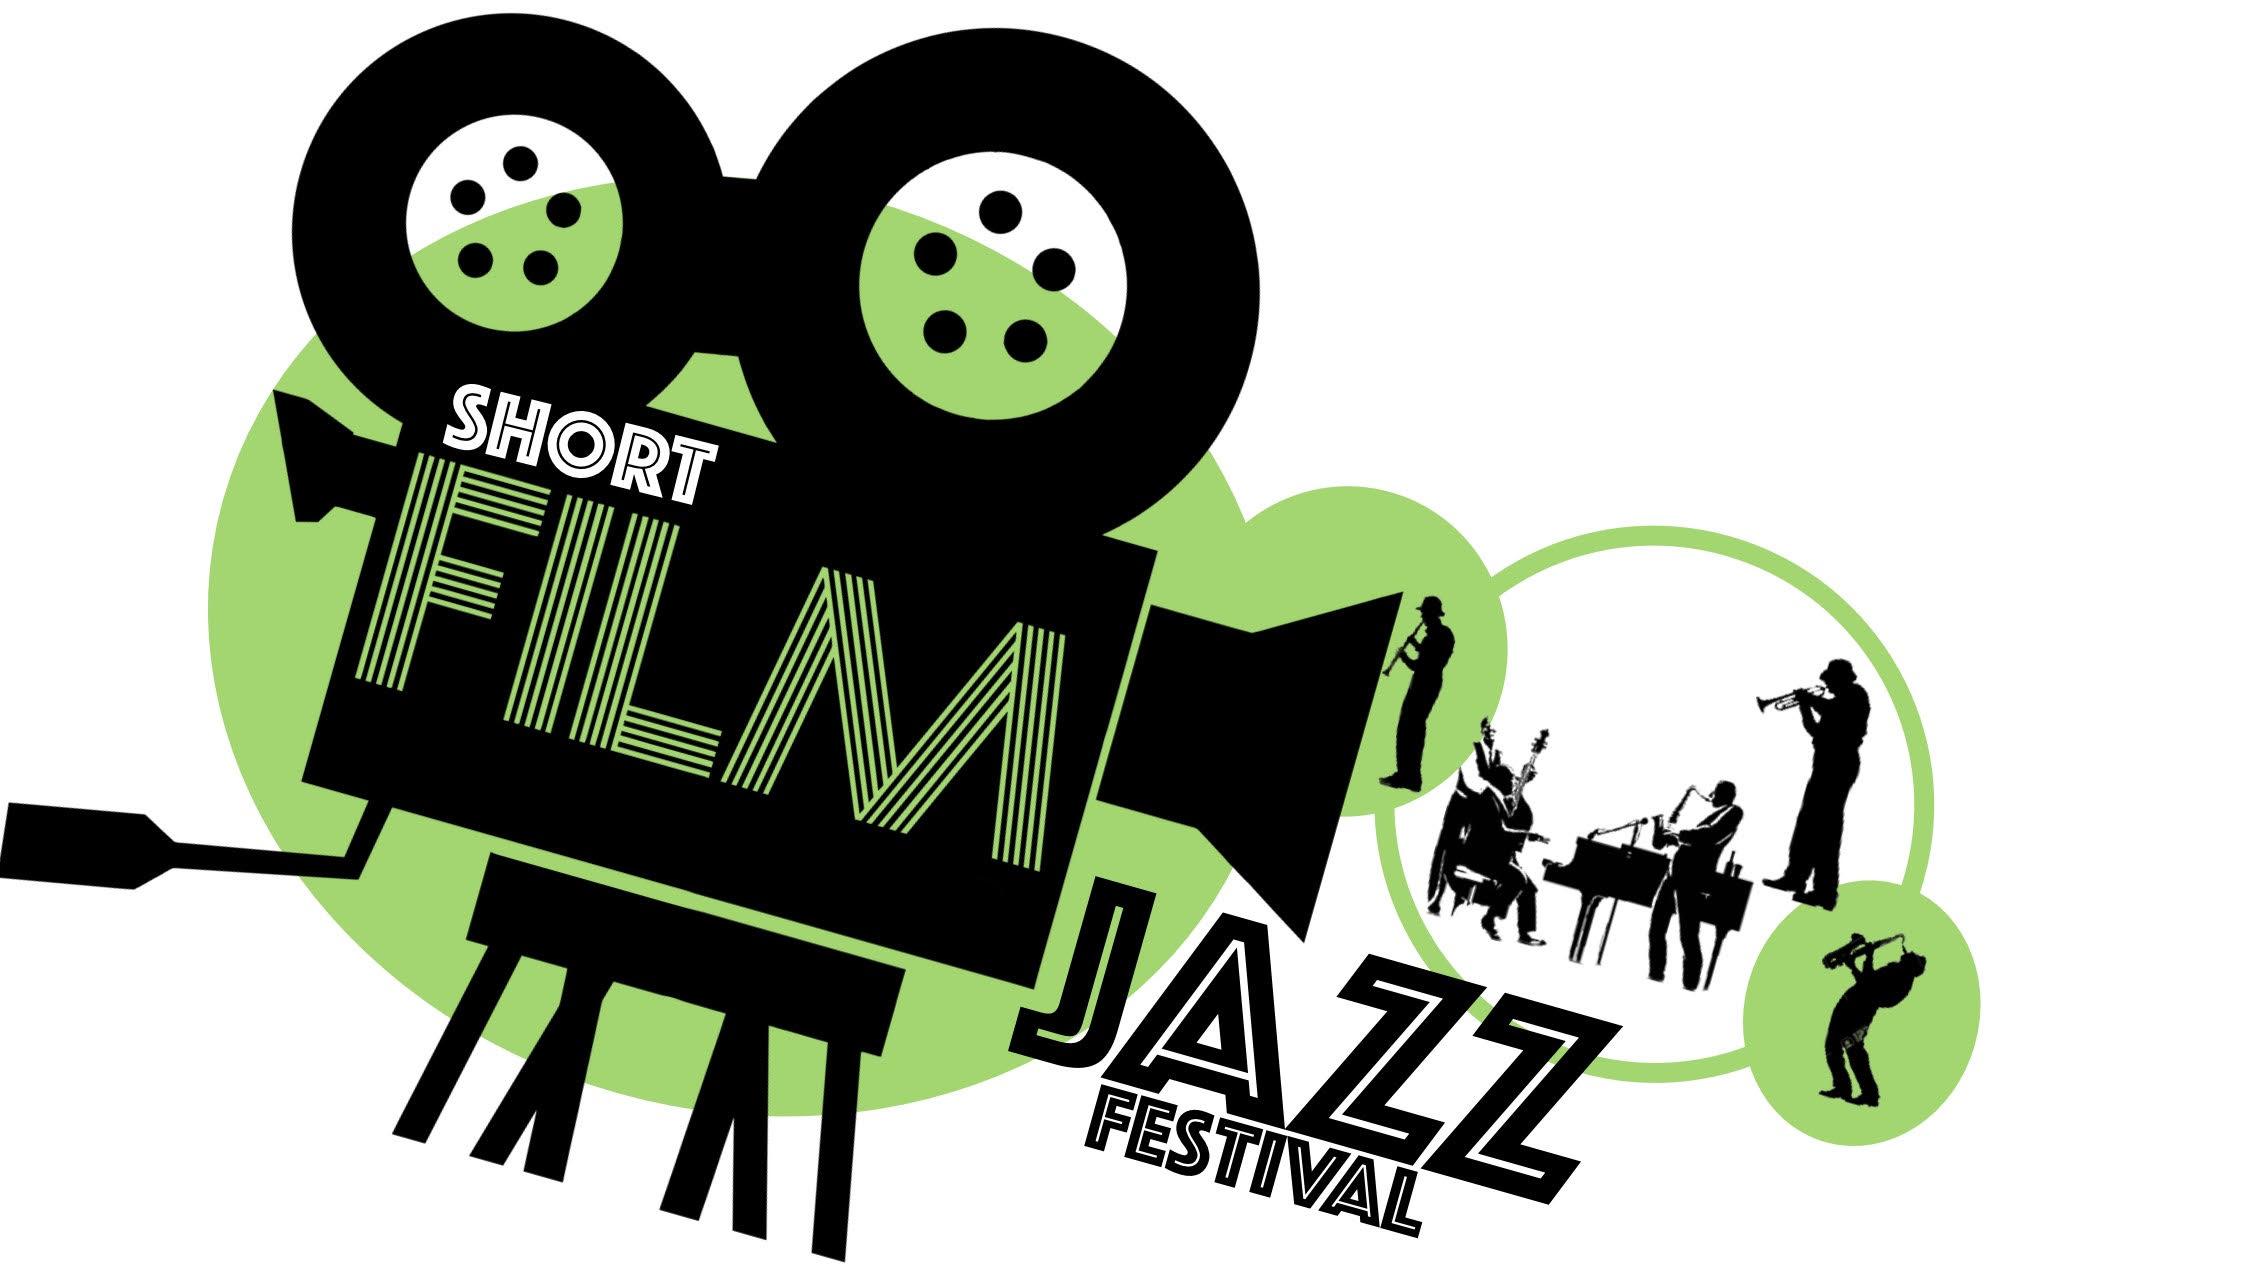 2265x1275 Arts, Short Film Amp Jazz Festivals Essex Art Center